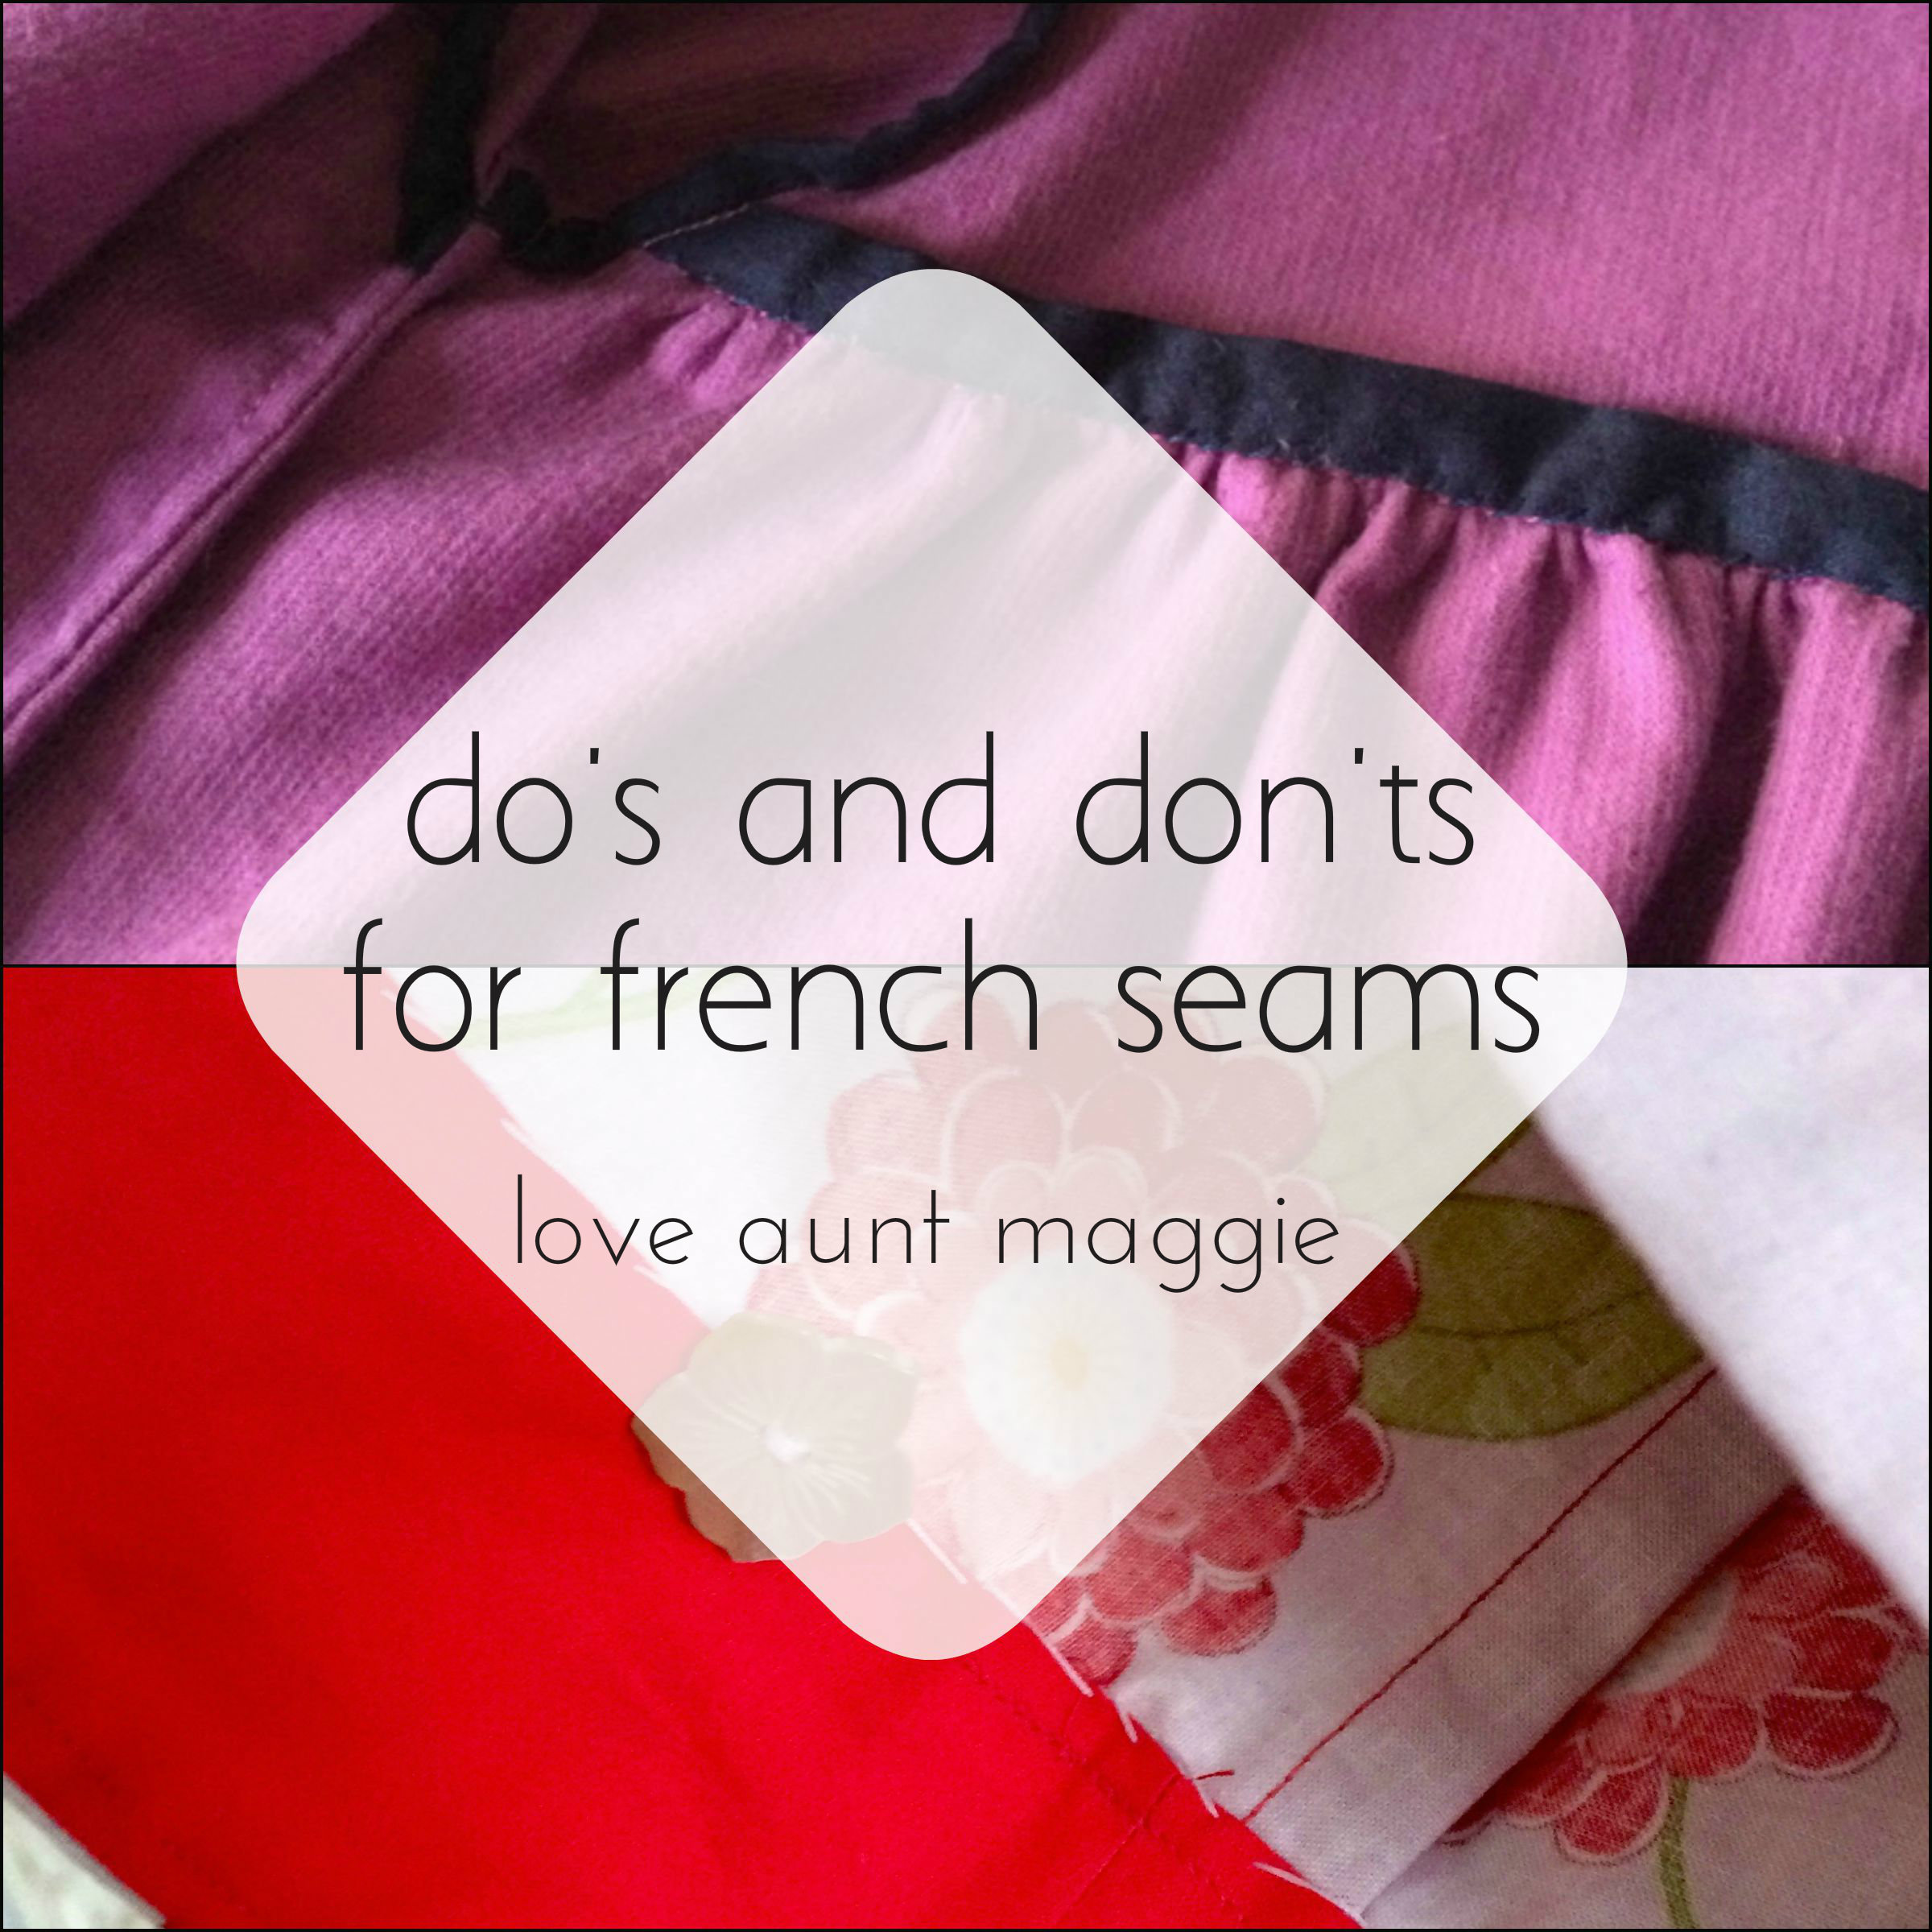 love aunt maggie - french seam thumbnail.jpg